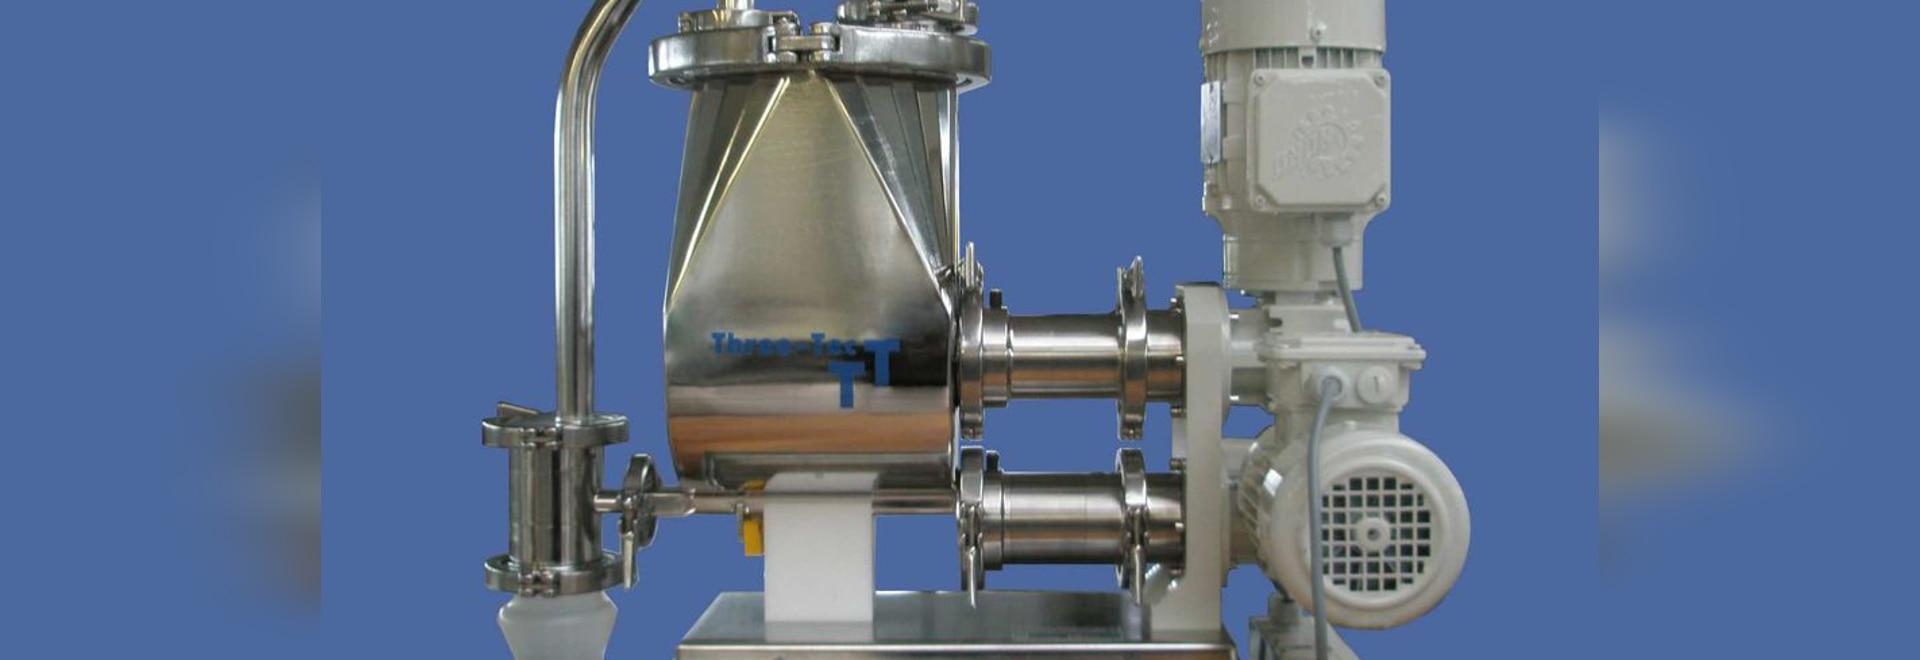 machine upper china jesebcxgqdku auger product screw feeder zs automatic feeding powder